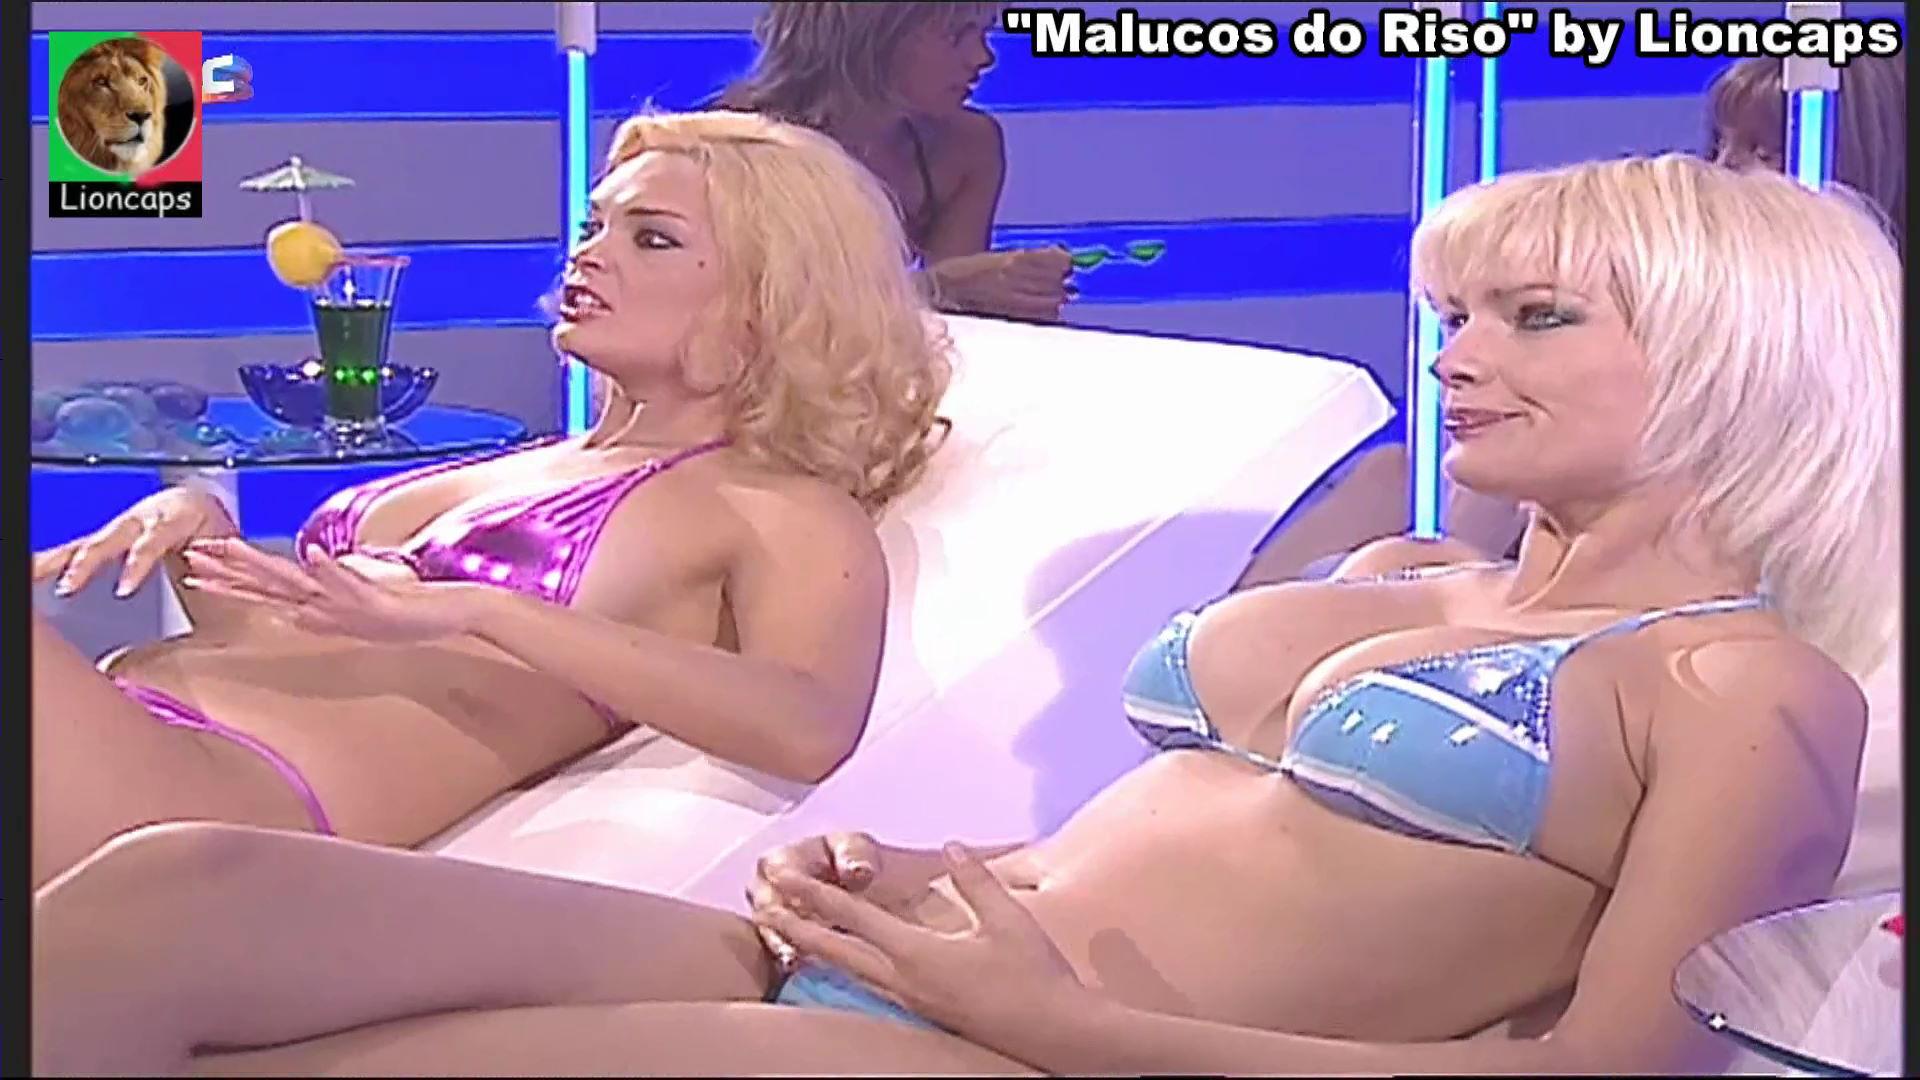 475169994_malucos_riso_alda_gomes_vs190malucos_riso_602_15075_122_169lo.JPG